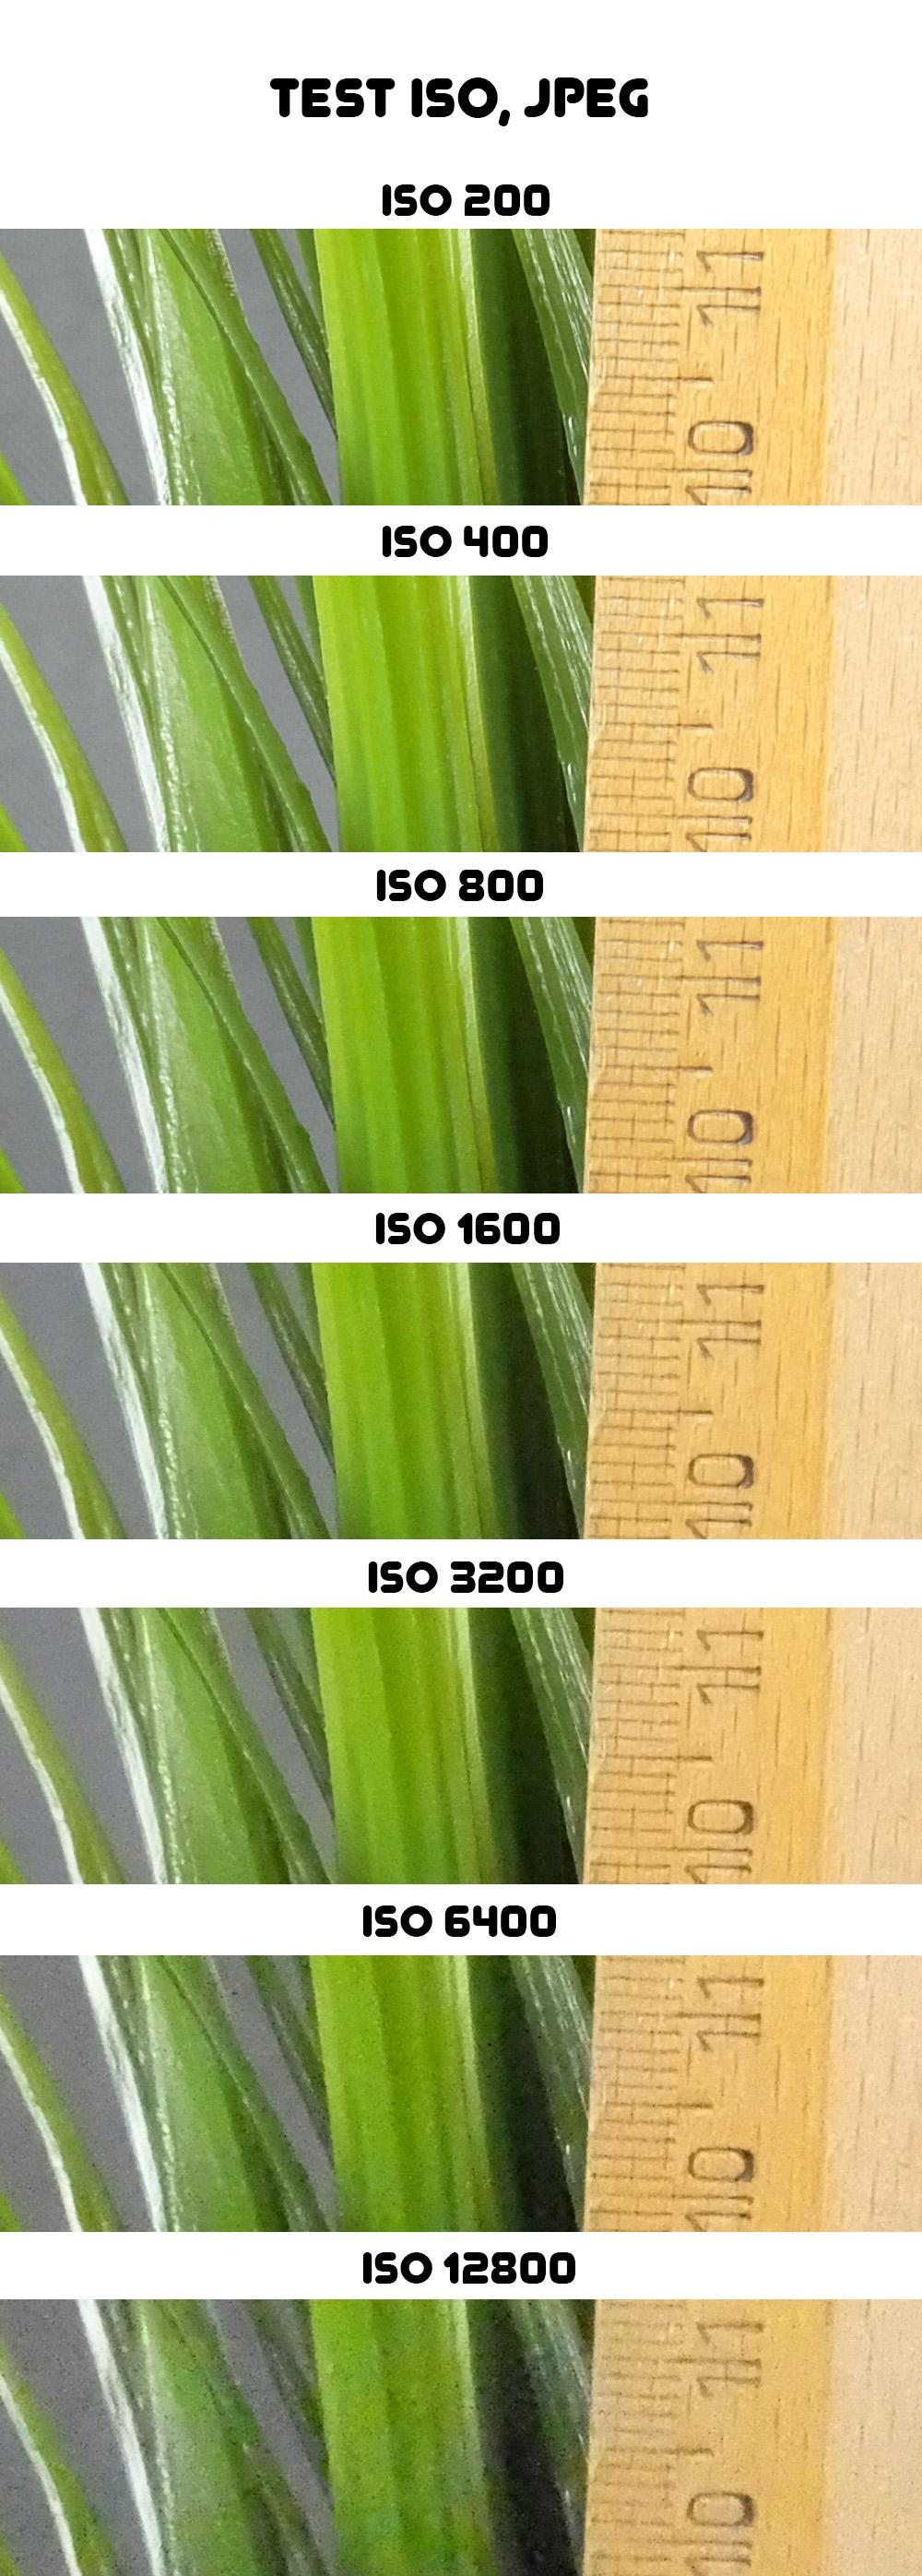 Fujifilm XQ1 - test ISO, JPEG